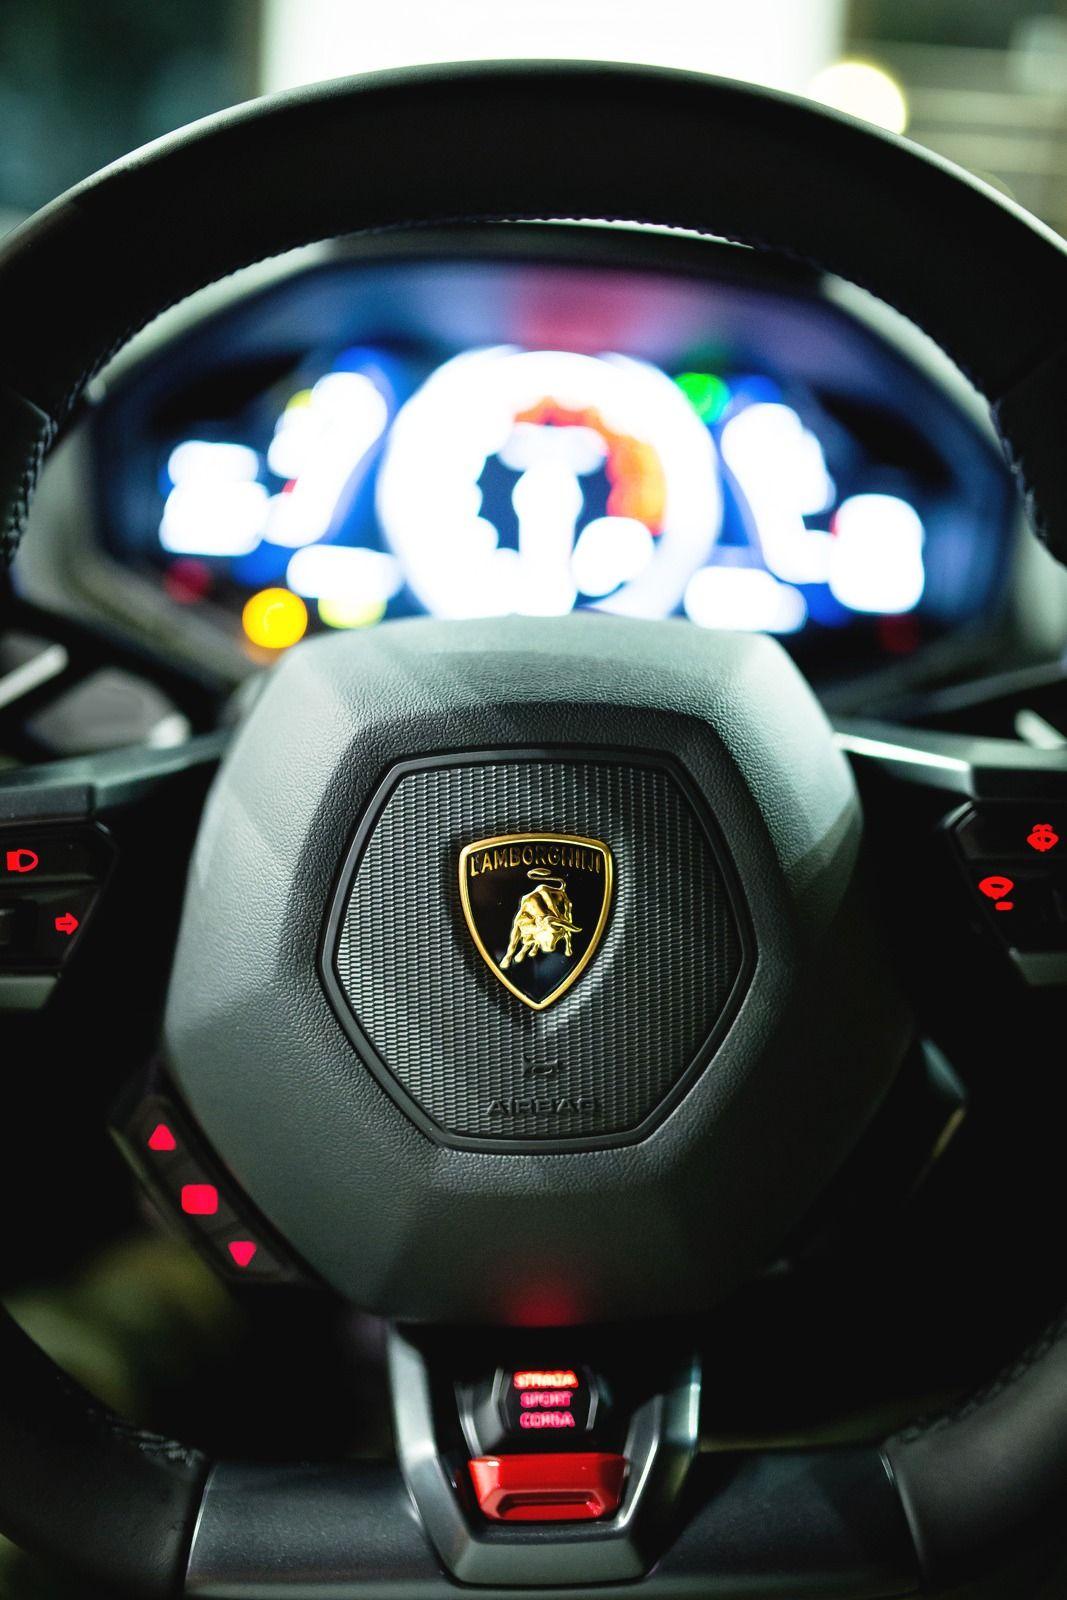 Lamborghini Cockpit Luxury Cars Audi Lamborghini Interior Lamborghini